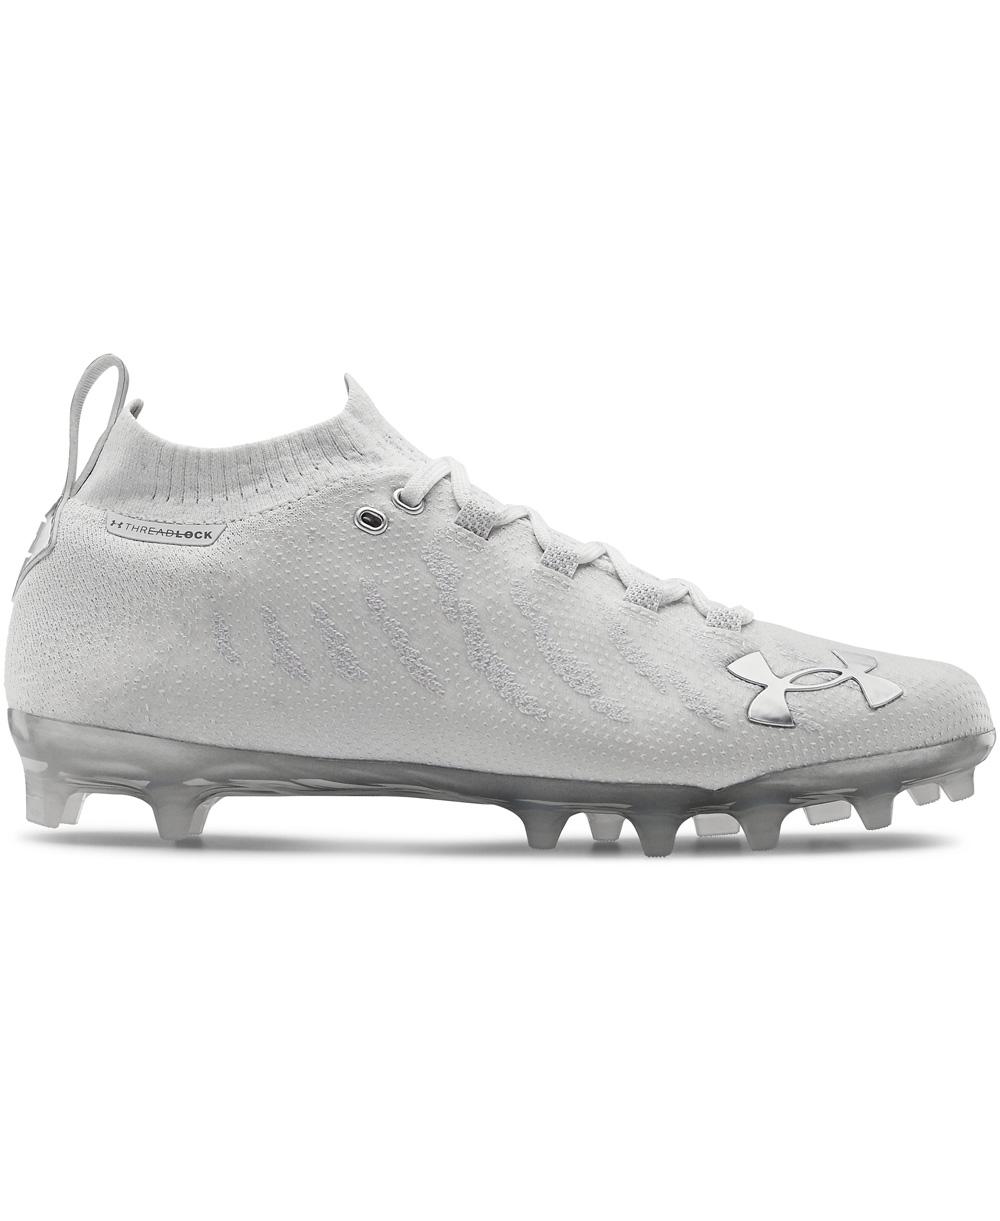 UA Spotlight Lux MC Zapatos de Fútbol Americano para Hombre White